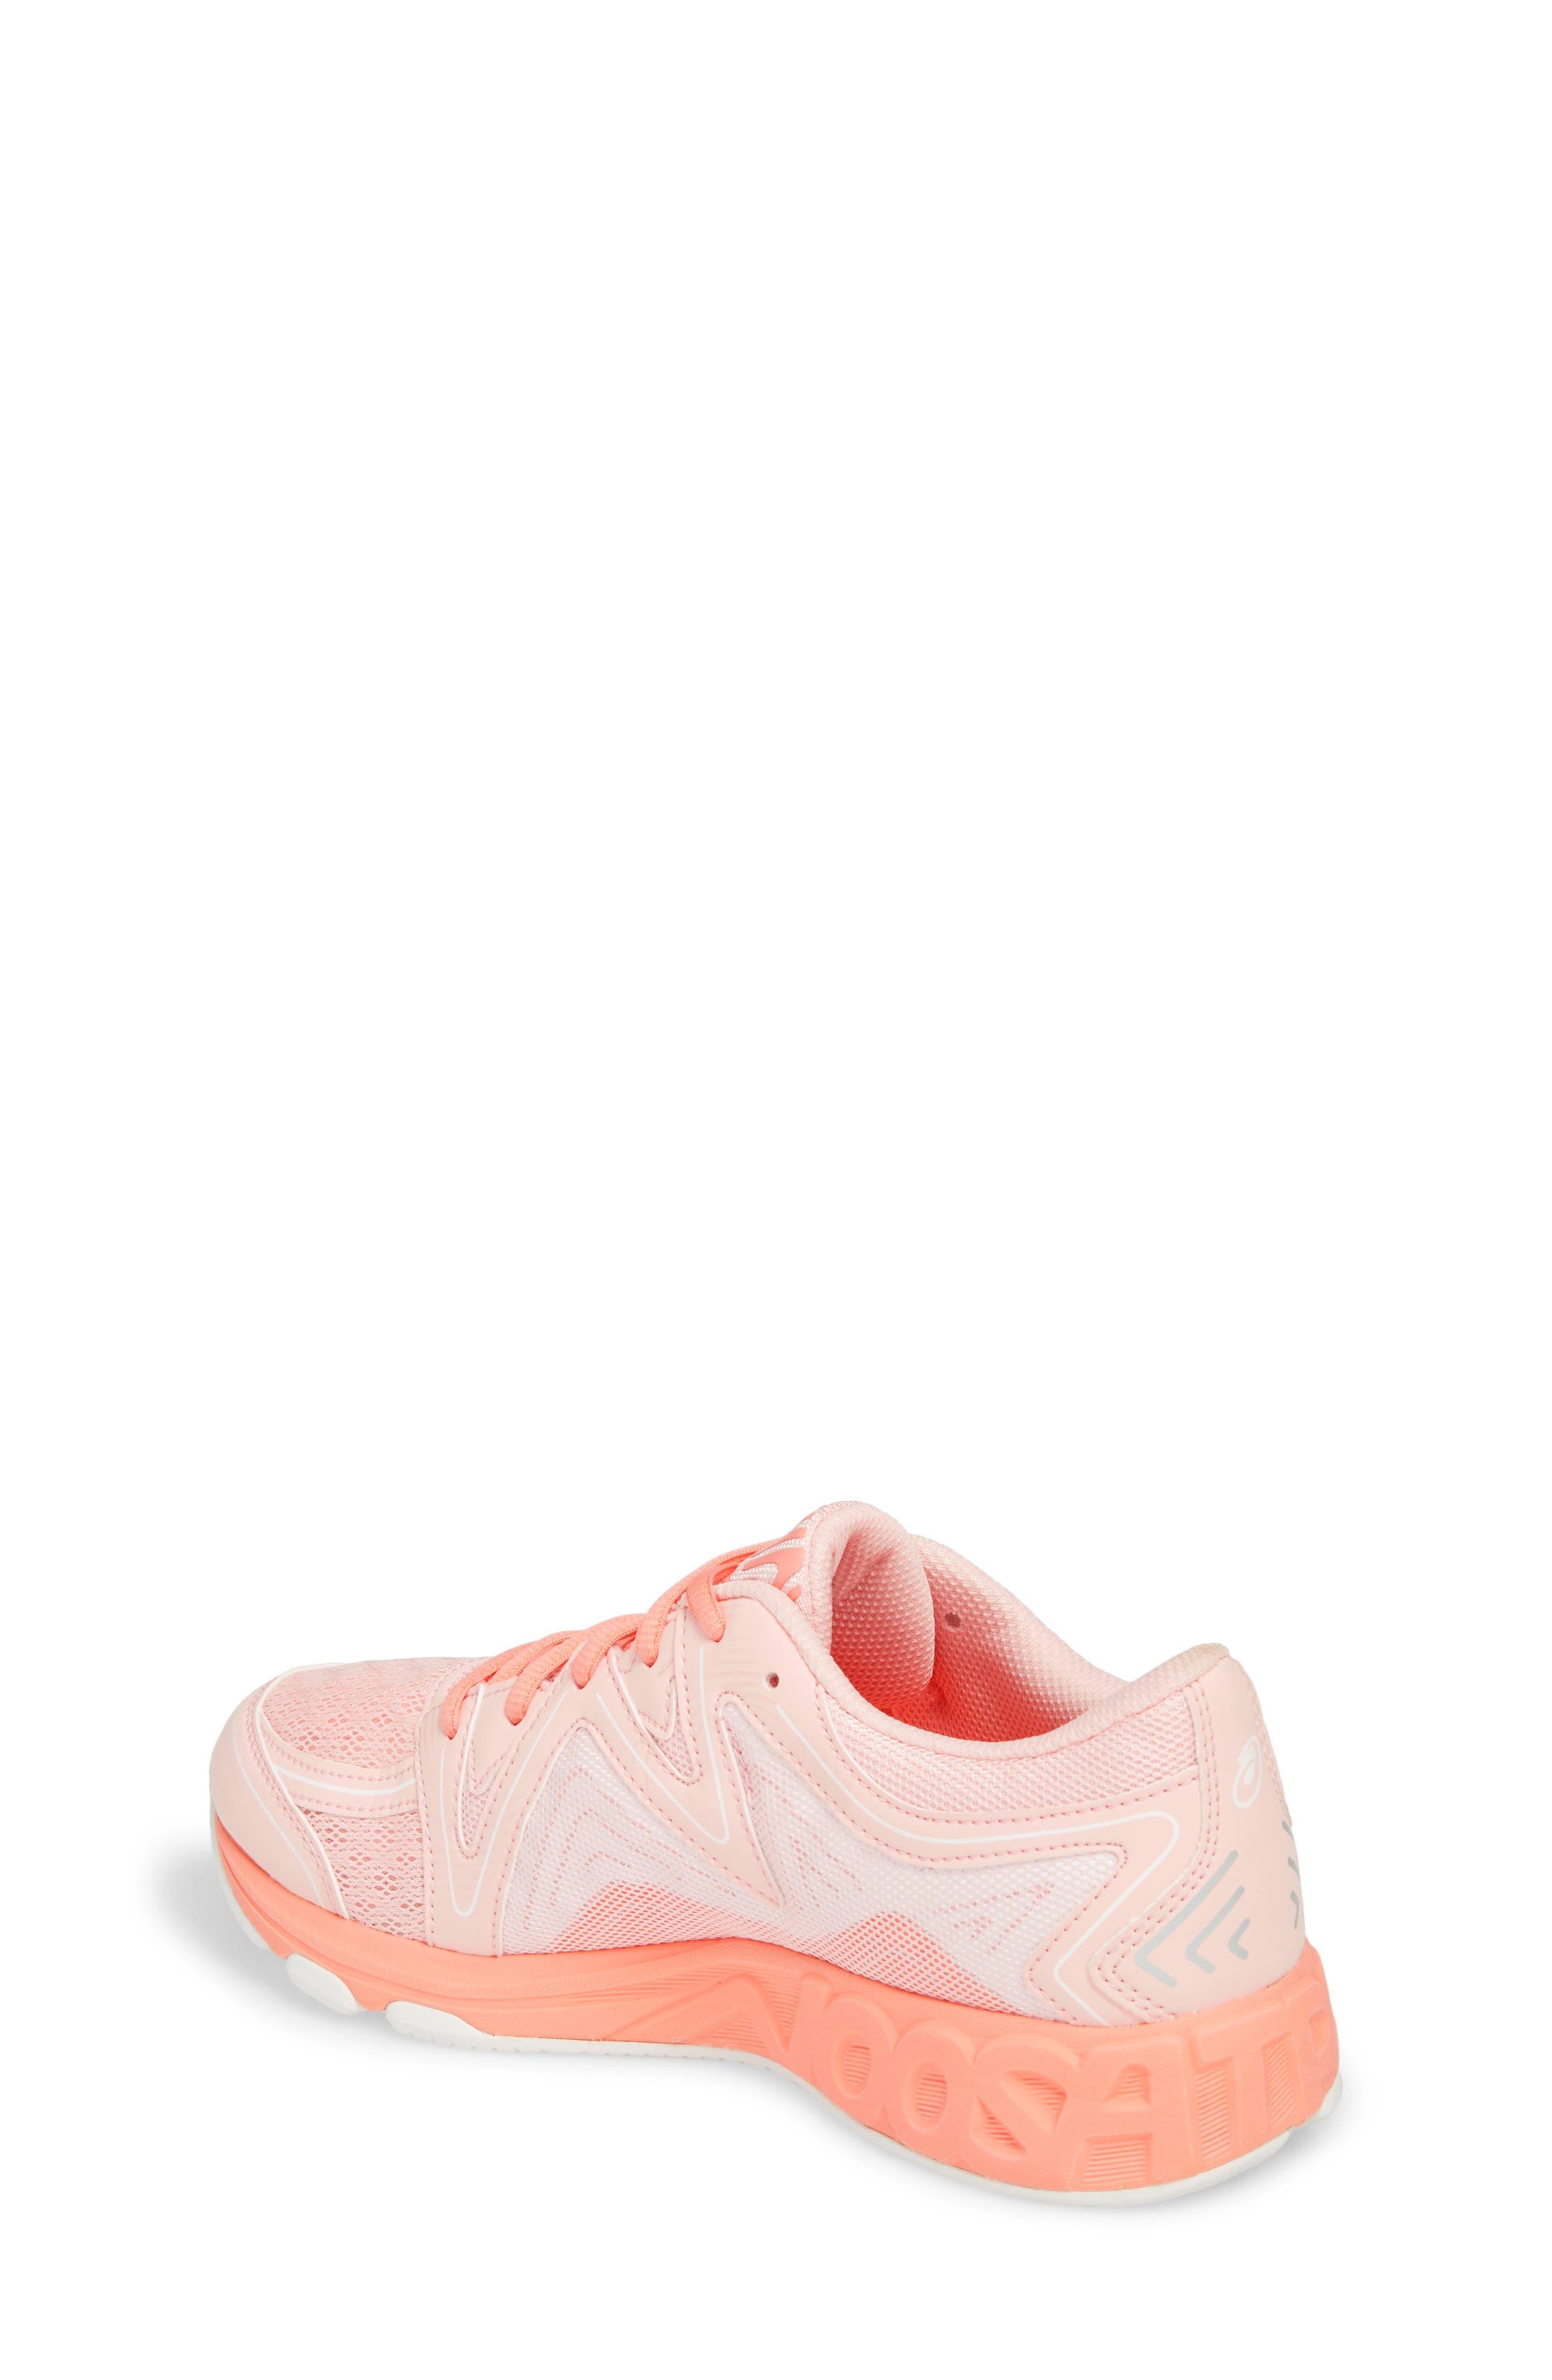 Noosa GS Sneaker,                             Alternate thumbnail 2, color,                             SEASHELL PINK/ BEGONIA/ WHITE